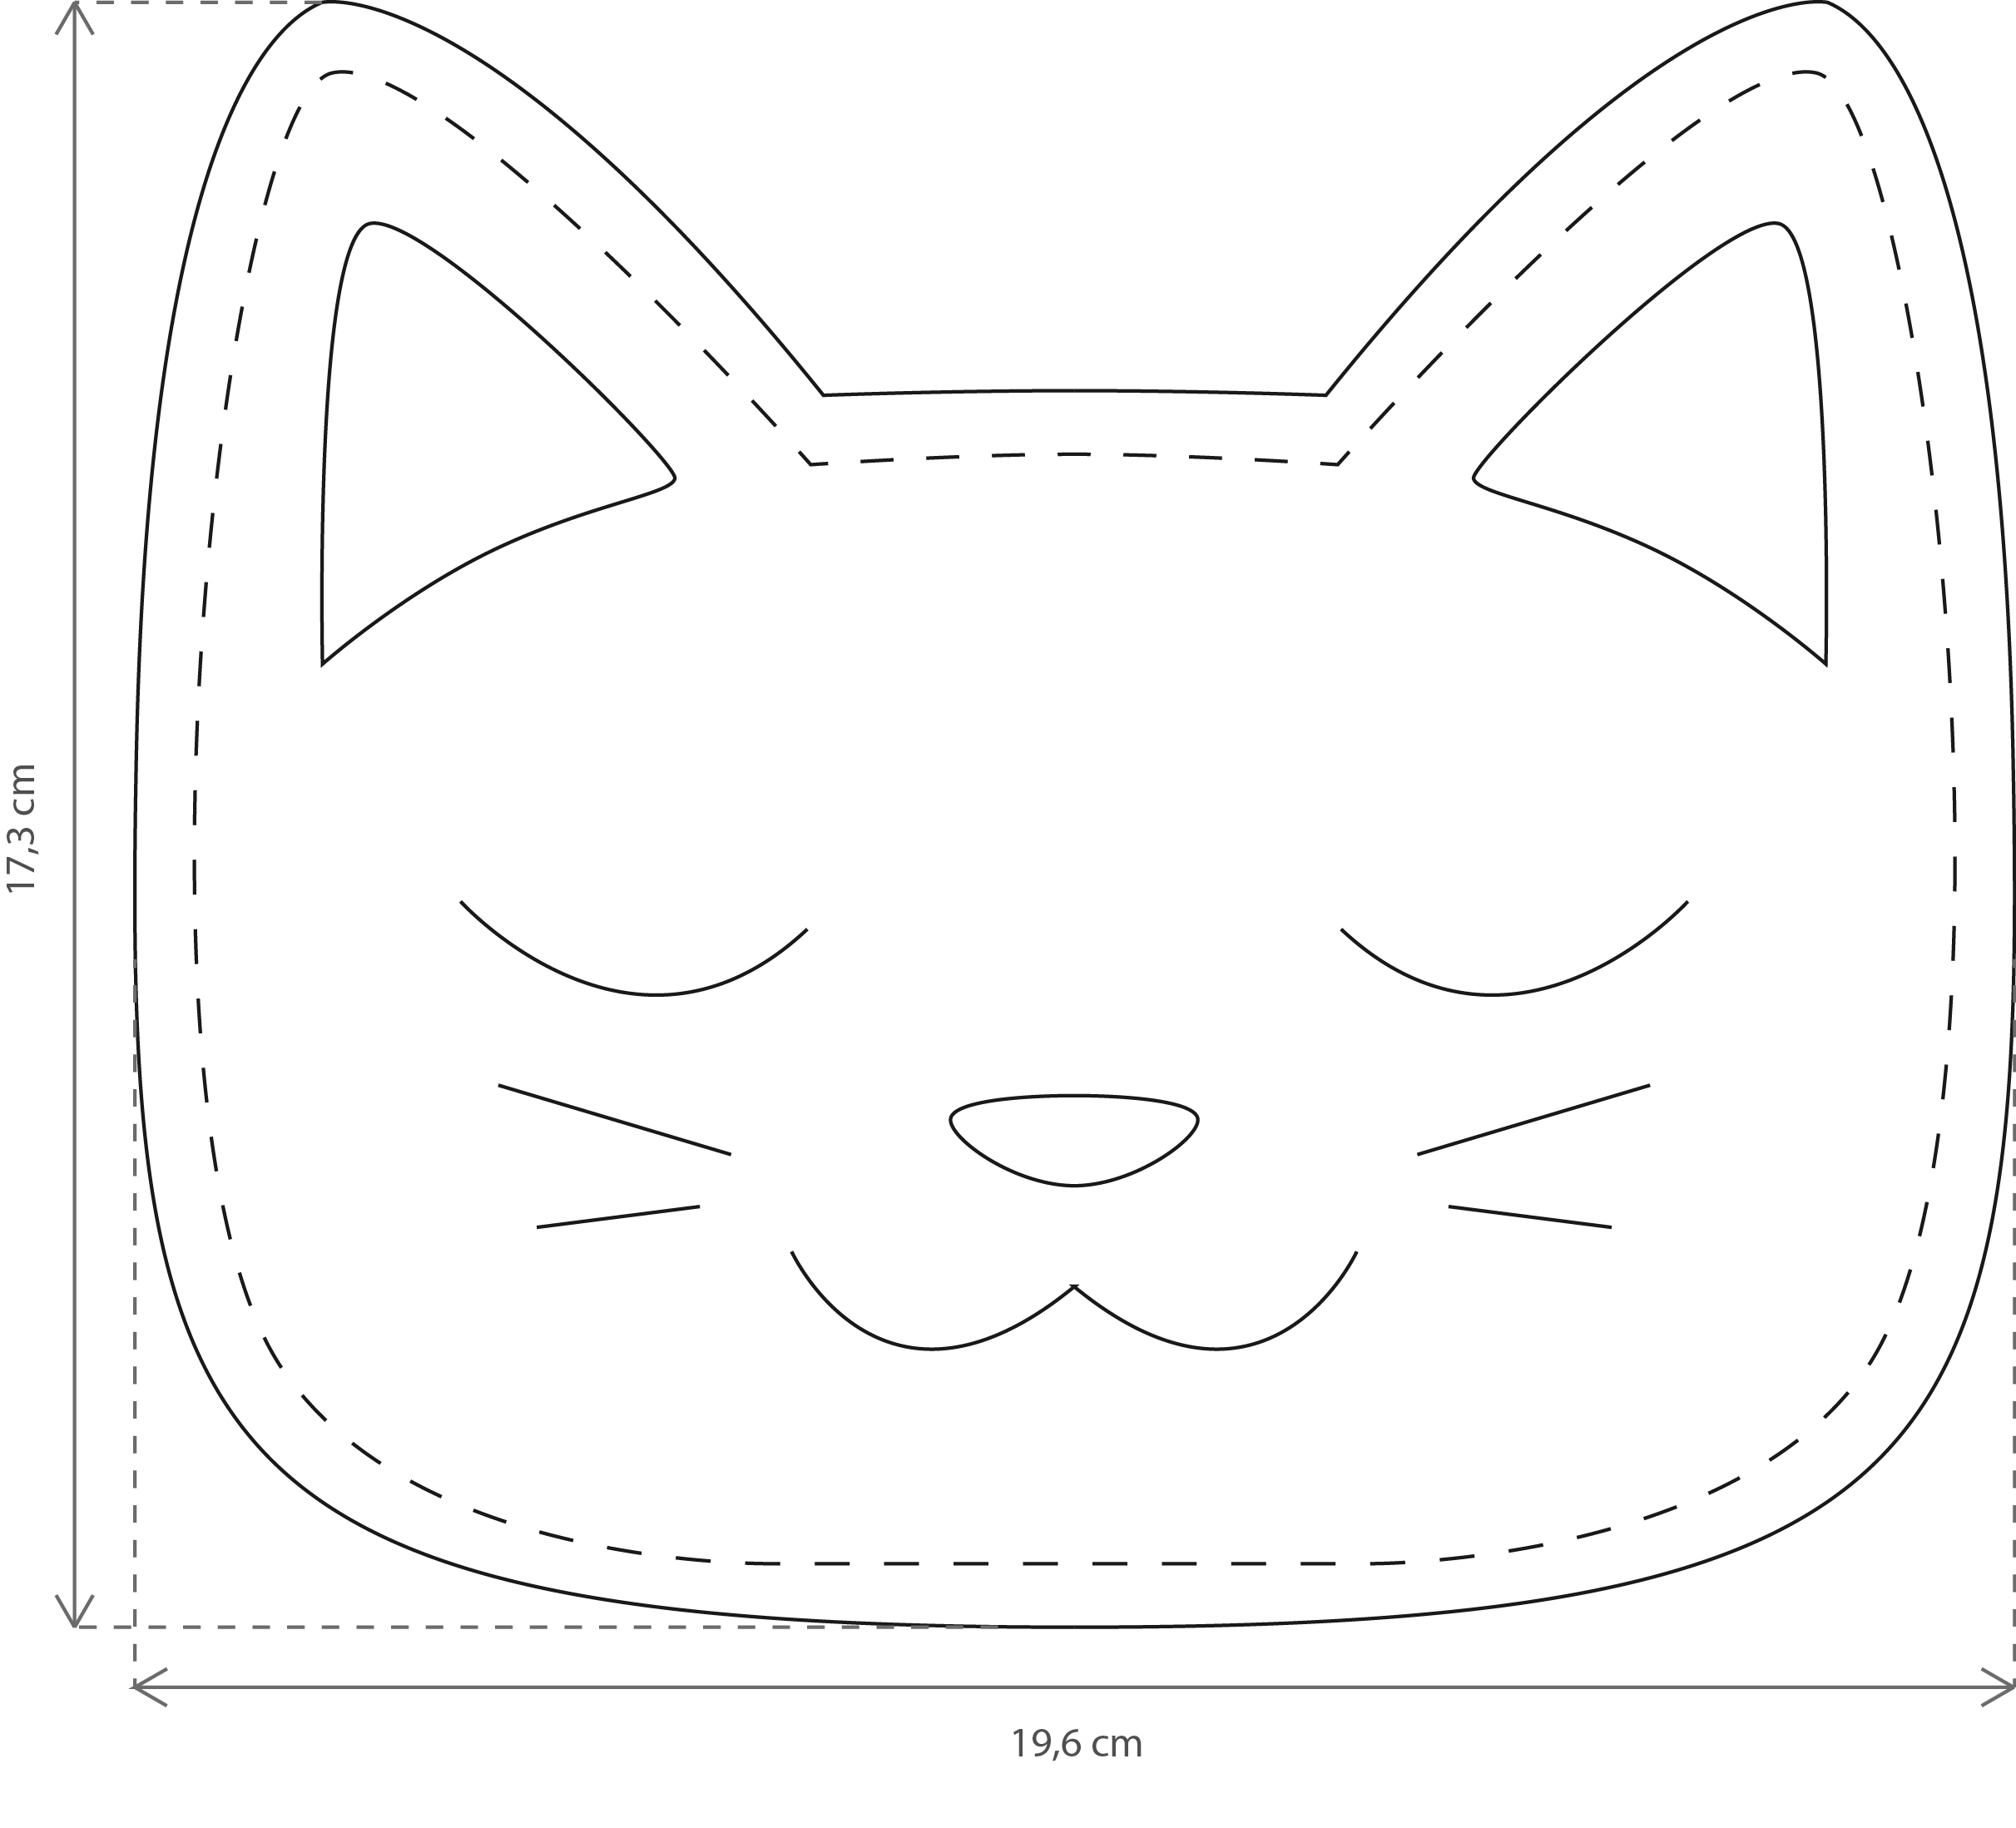 Schön Nähen Katze Muster Bilder - Nähmuster-Ideen - sarasara.info